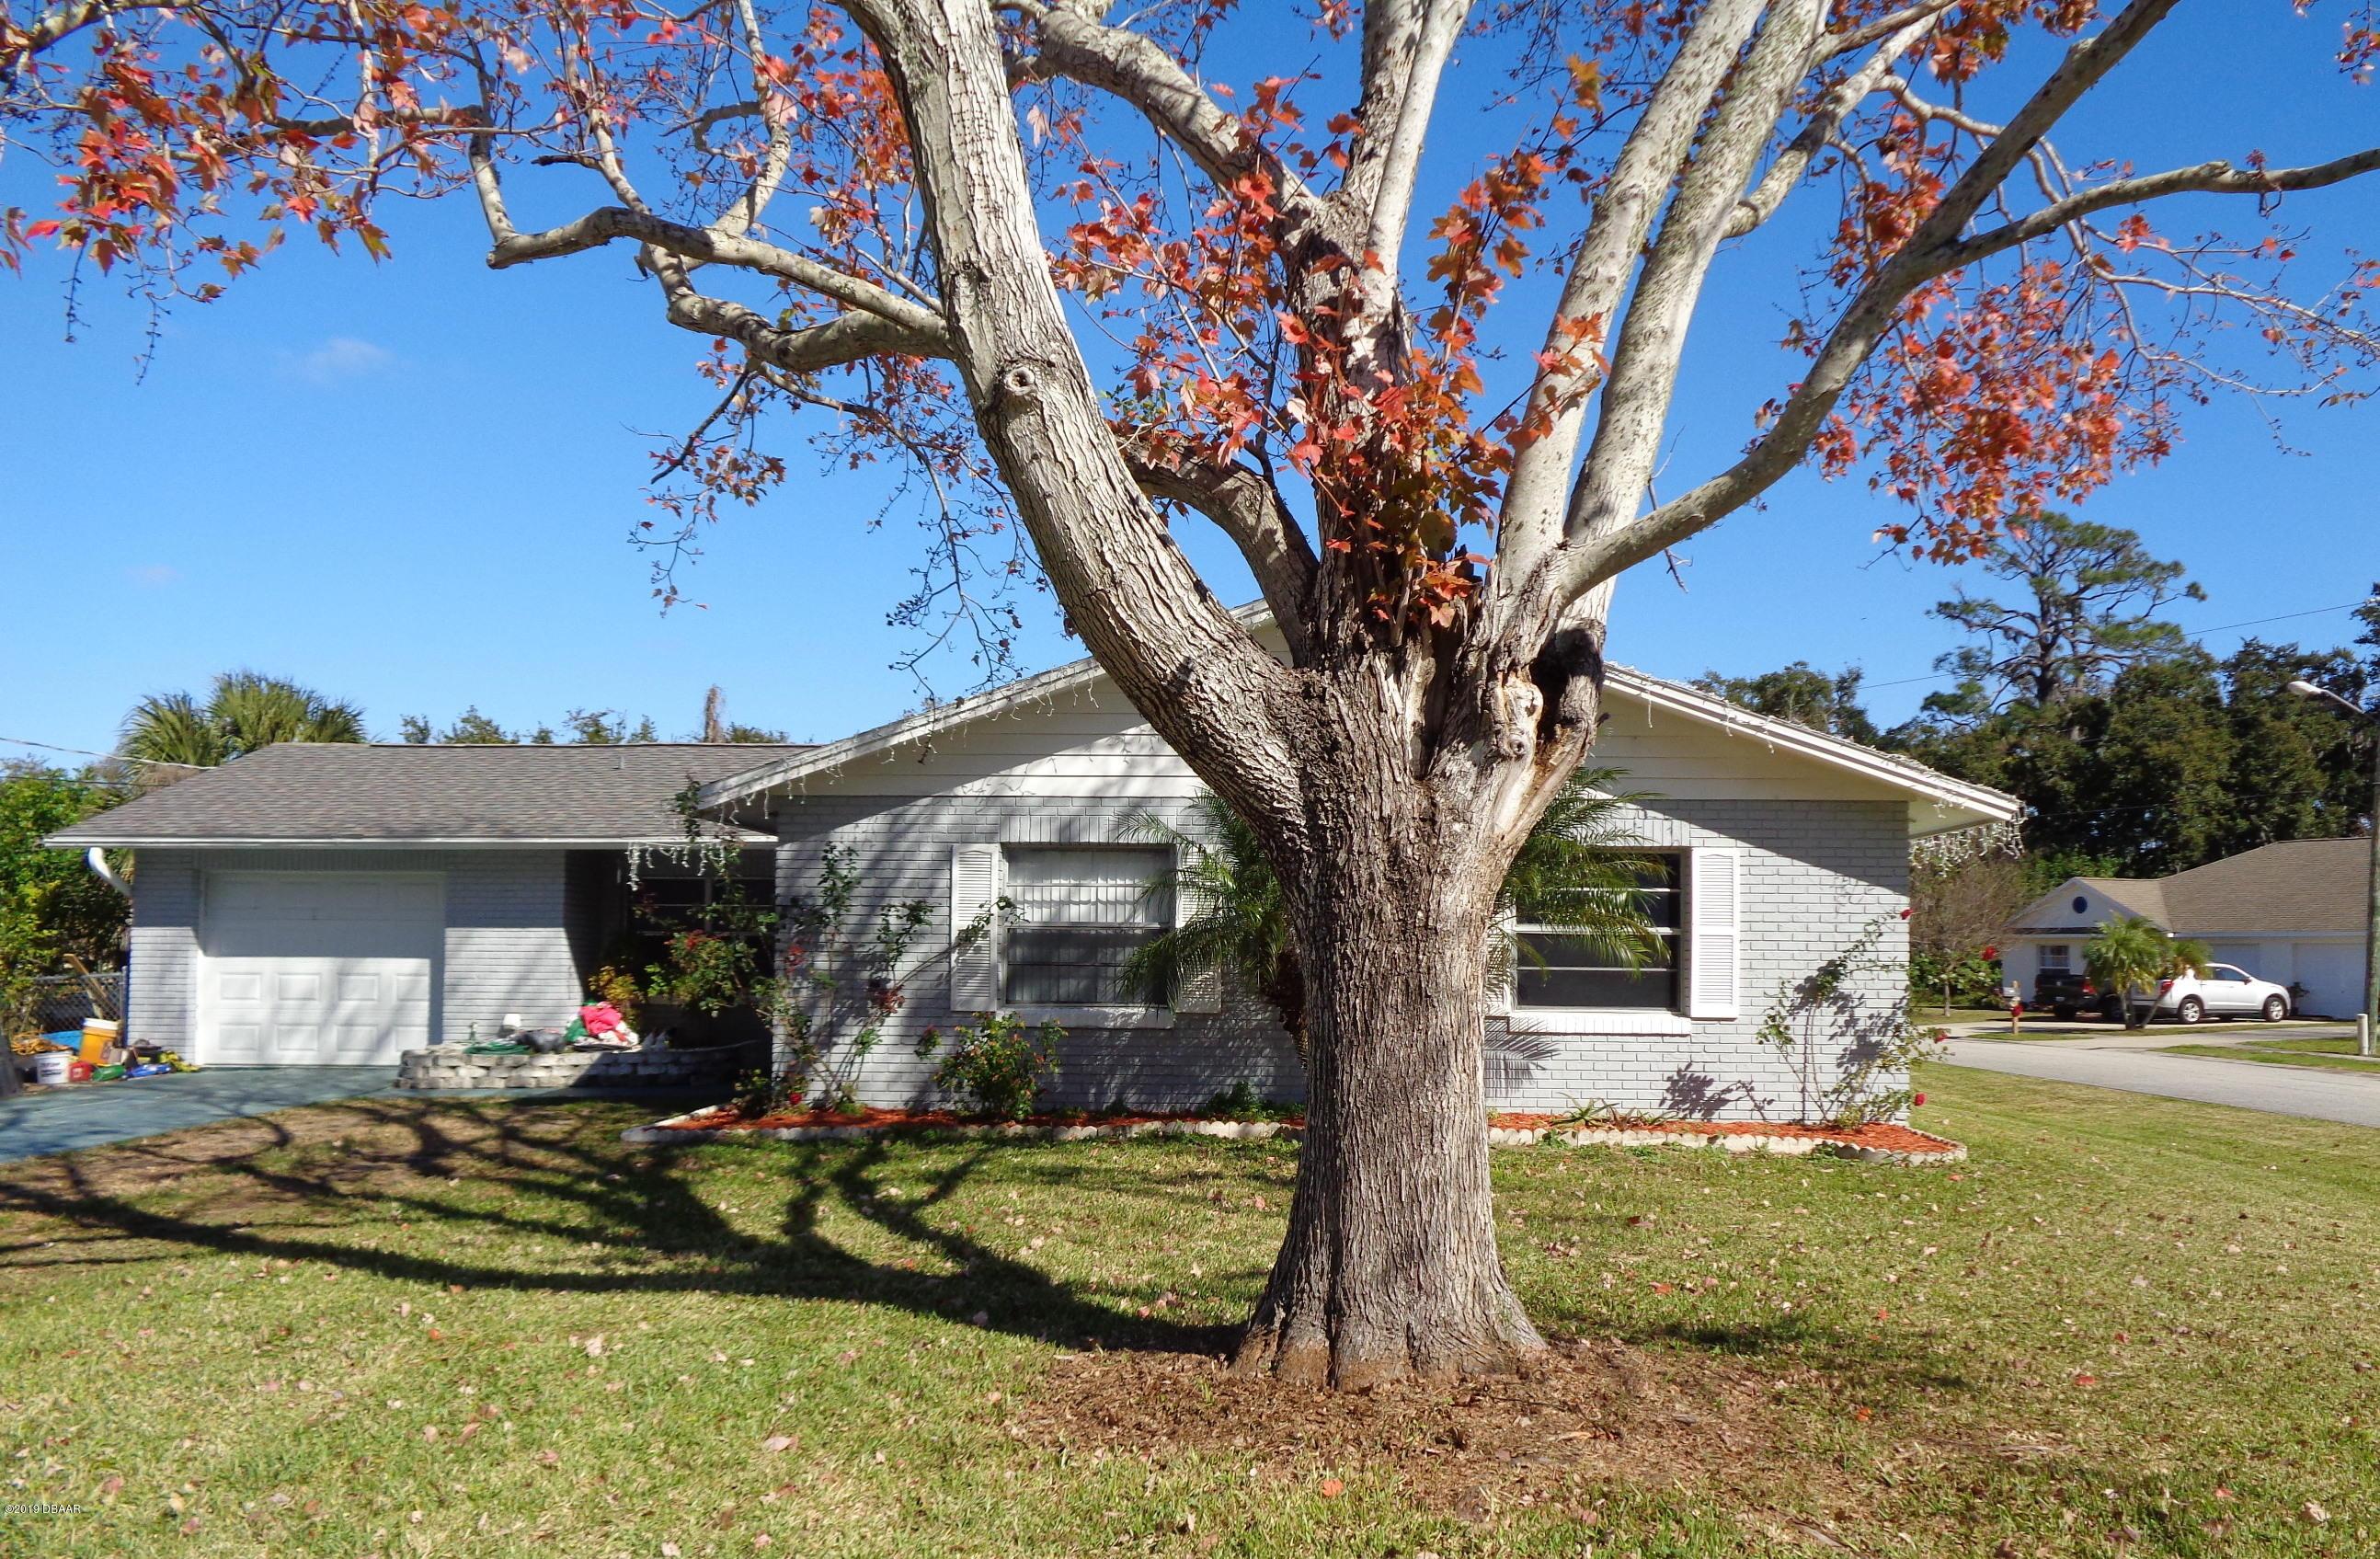 Port Orange Homes For Sale 3 Bedrooms 2 Bathrooms